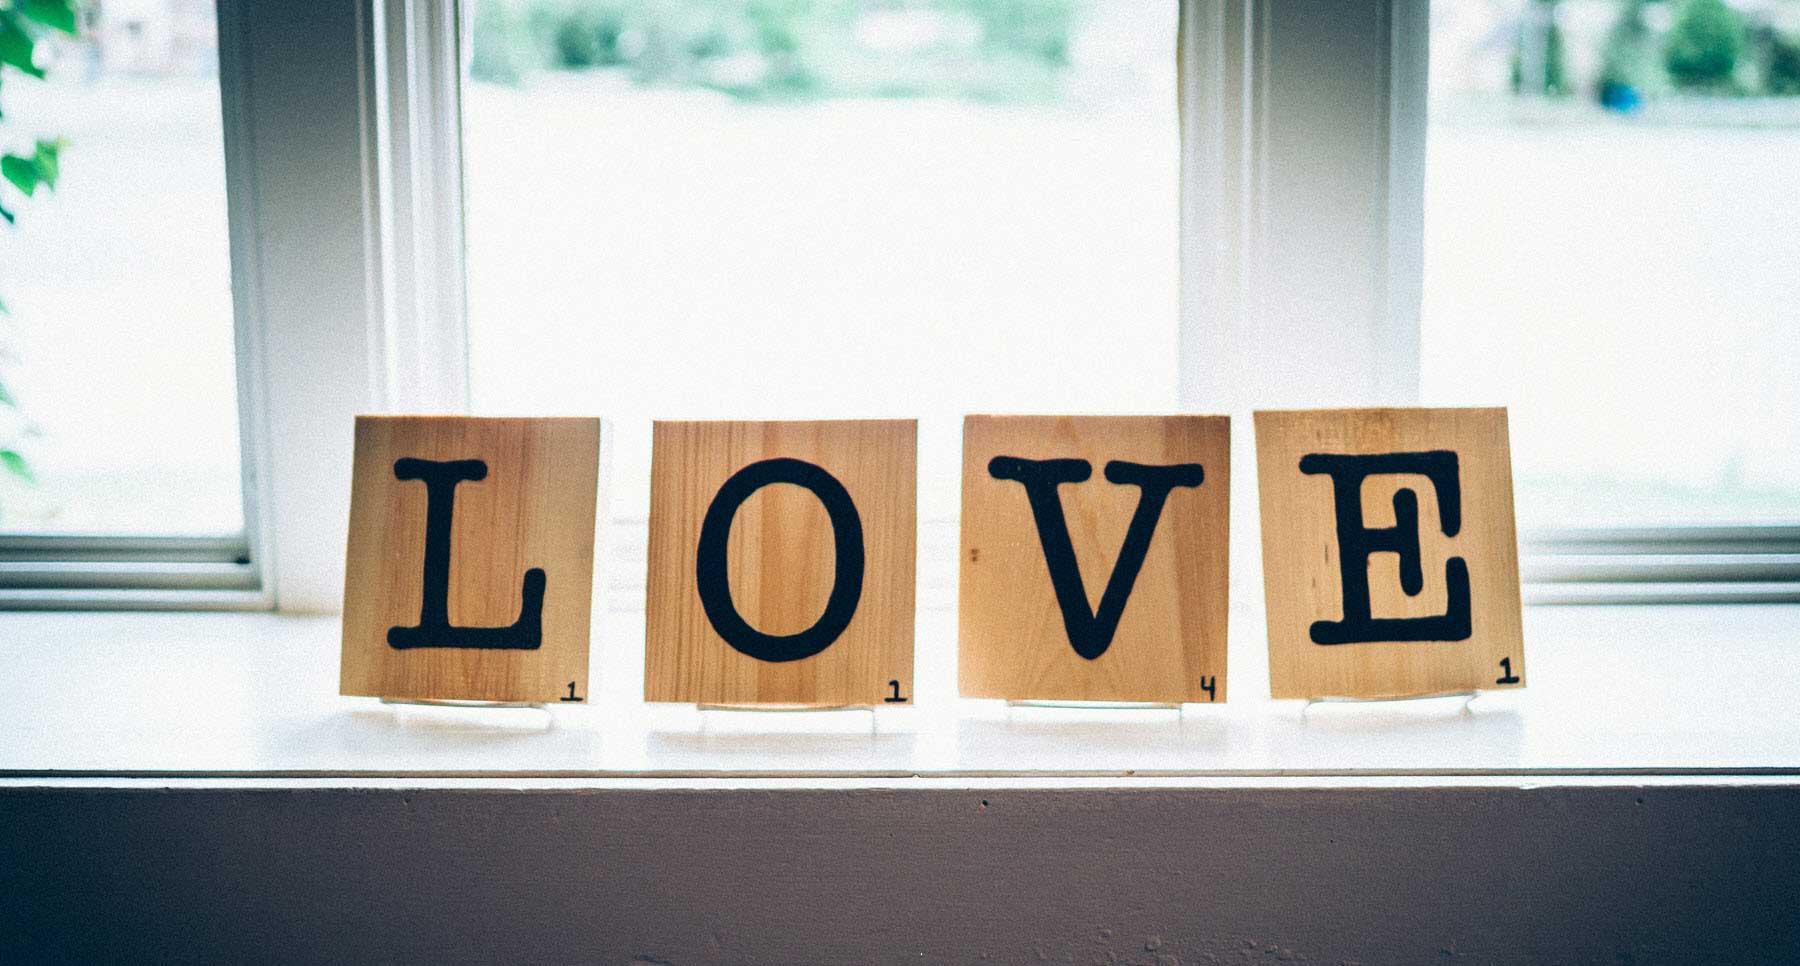 scrabble tiles that spell love on a window sill